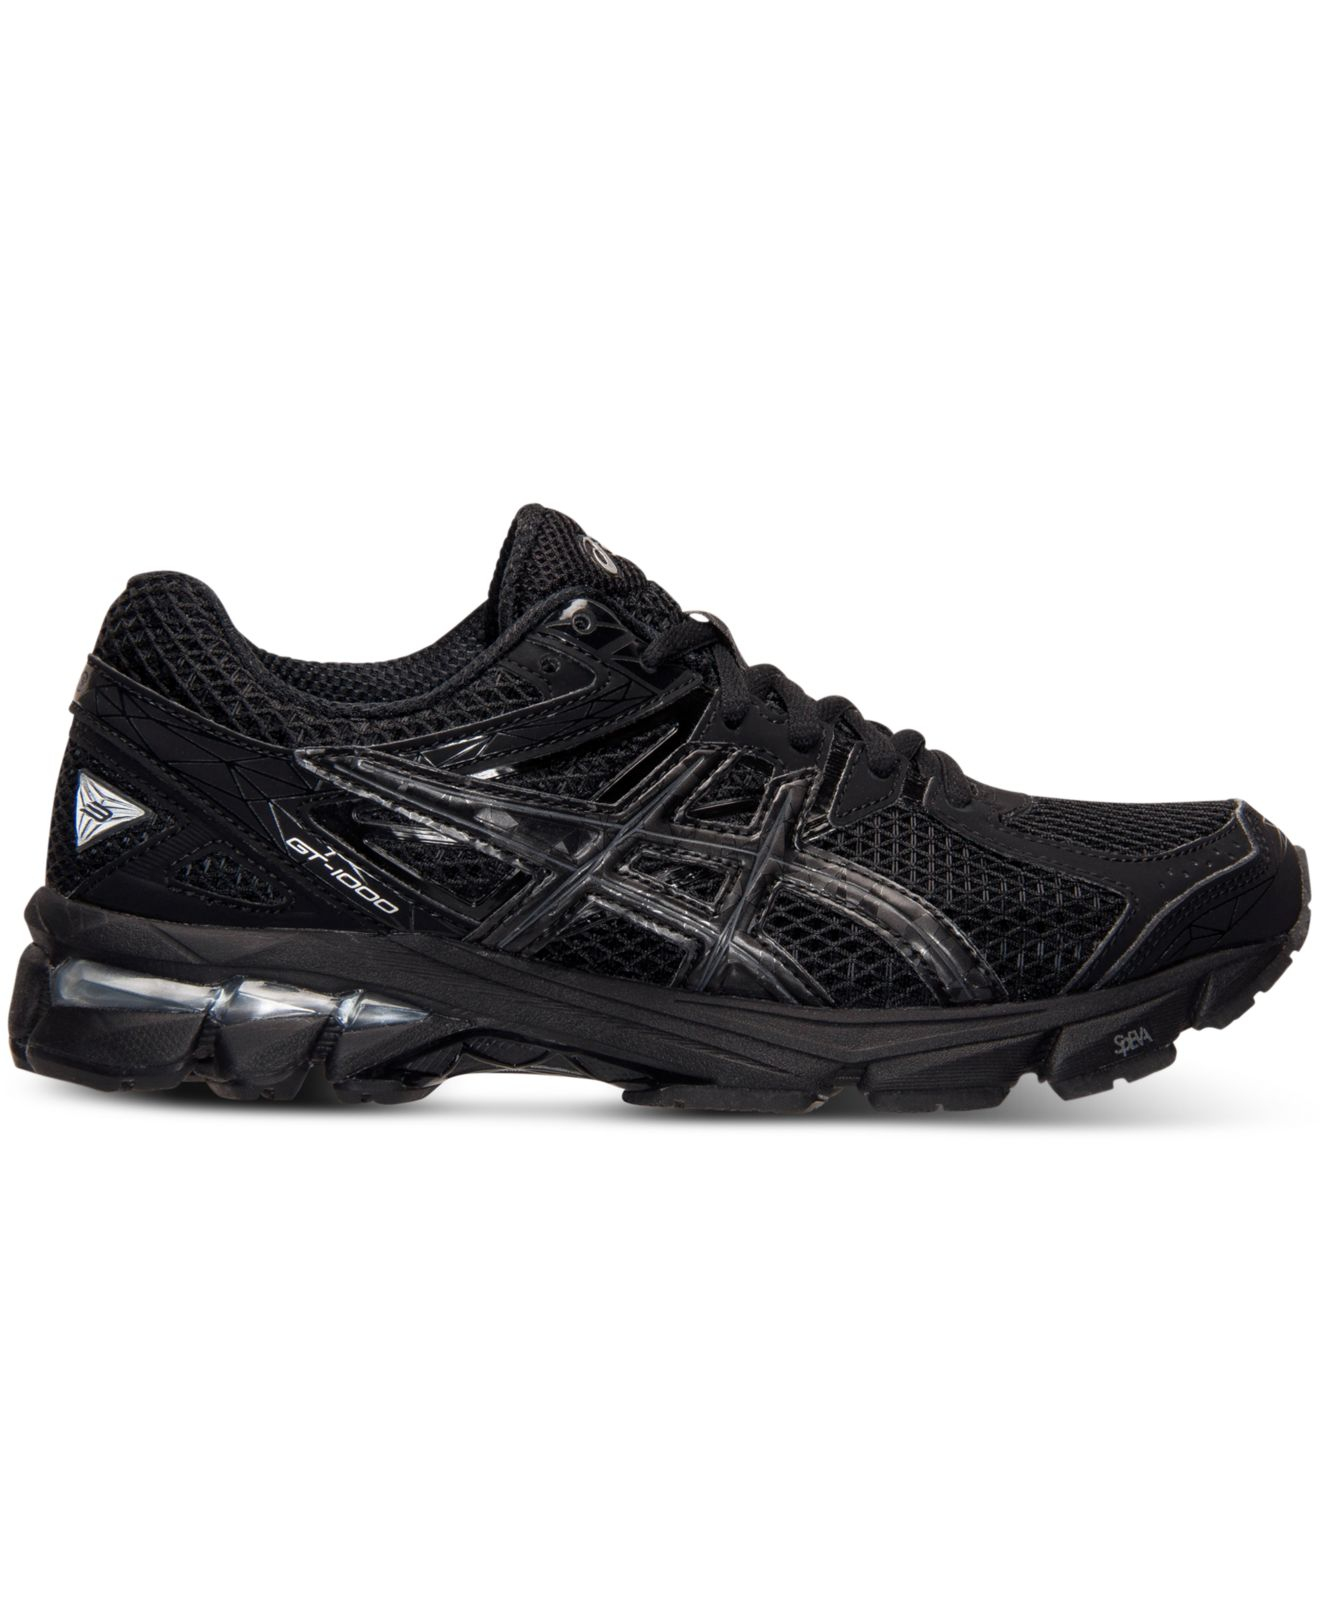 Asics Women S Gt   Running Shoes Black